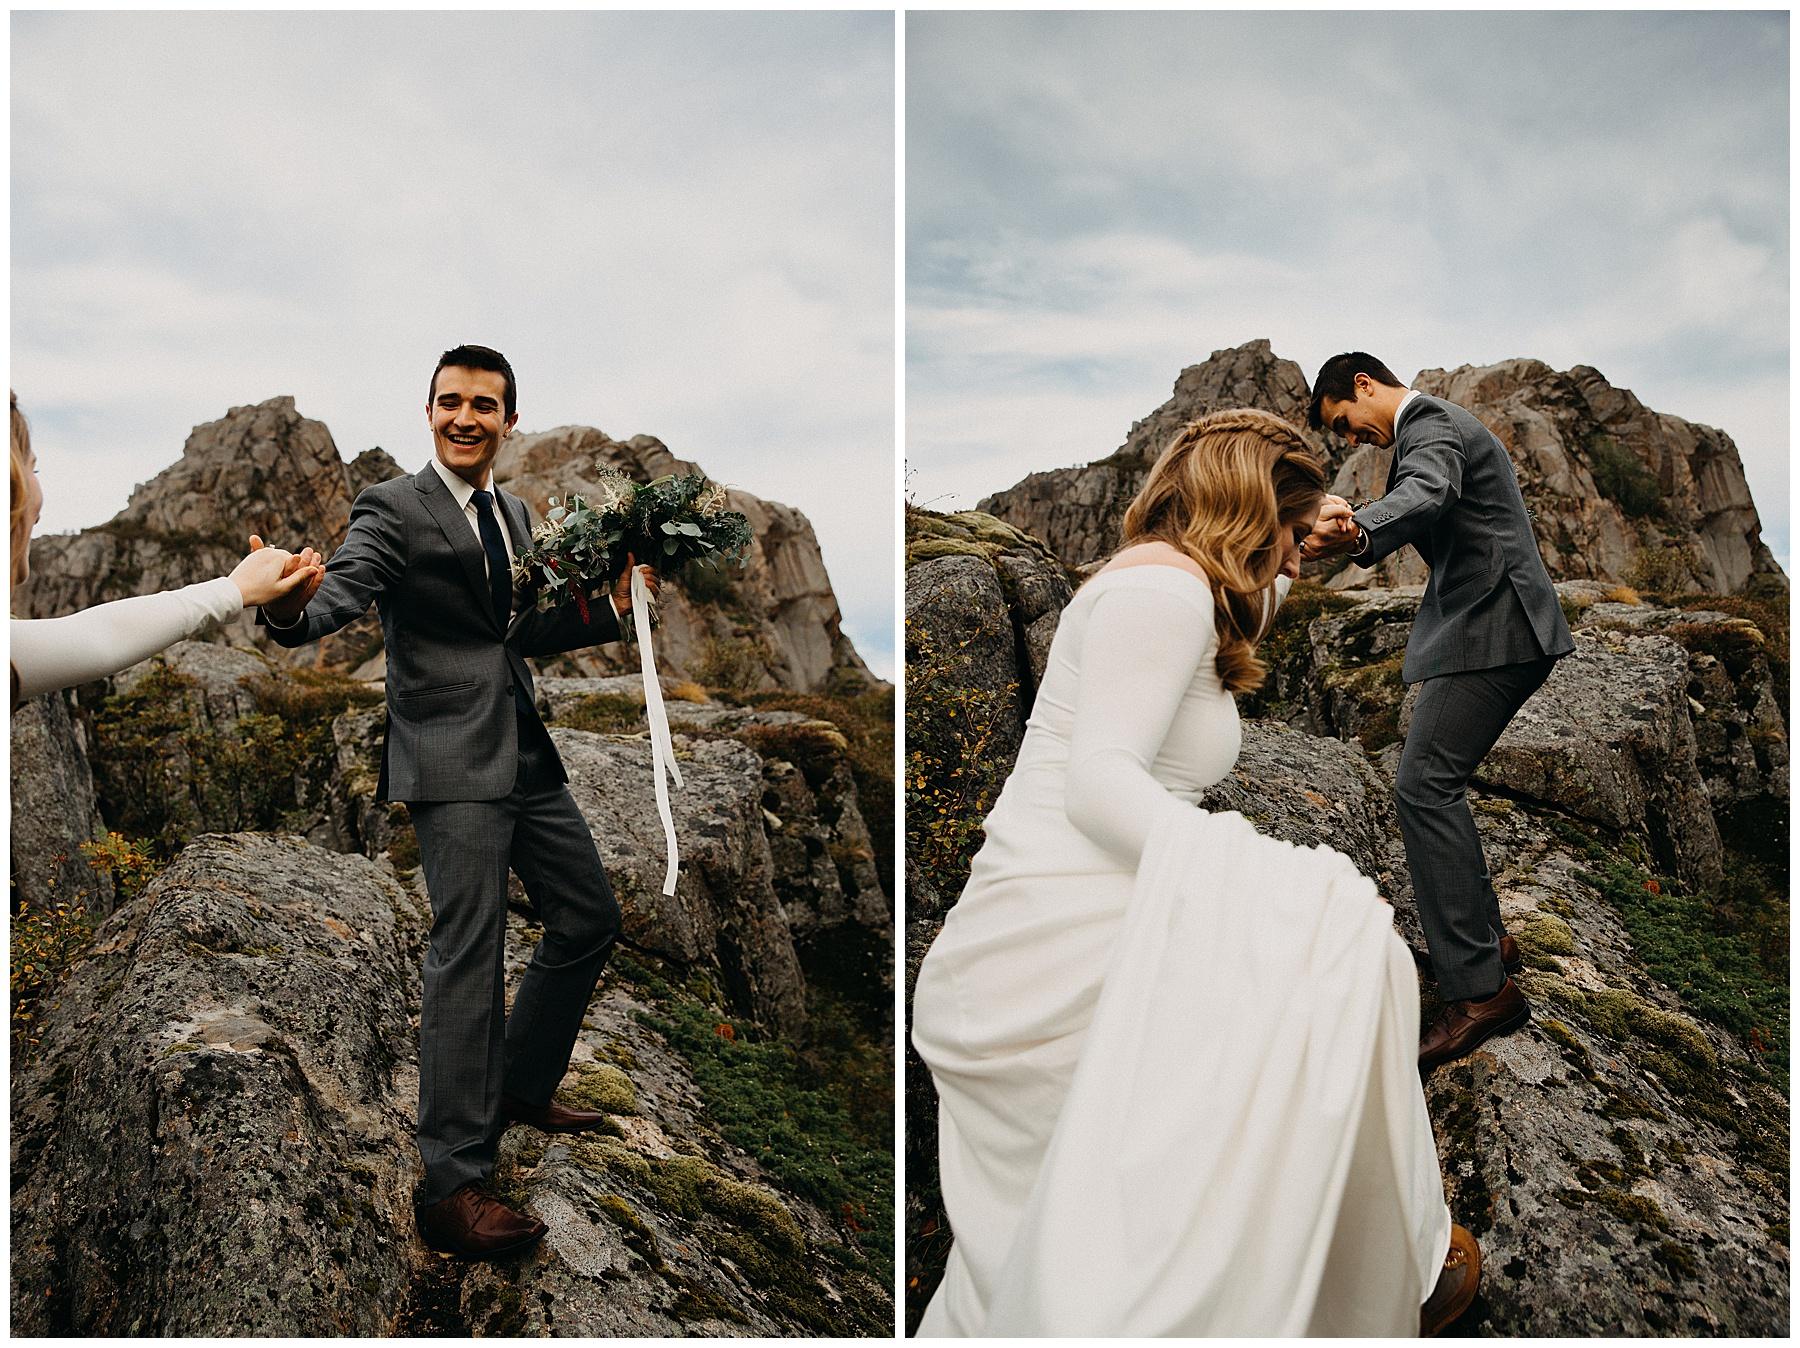 Mountaintop Elopement - Kristian & Seth